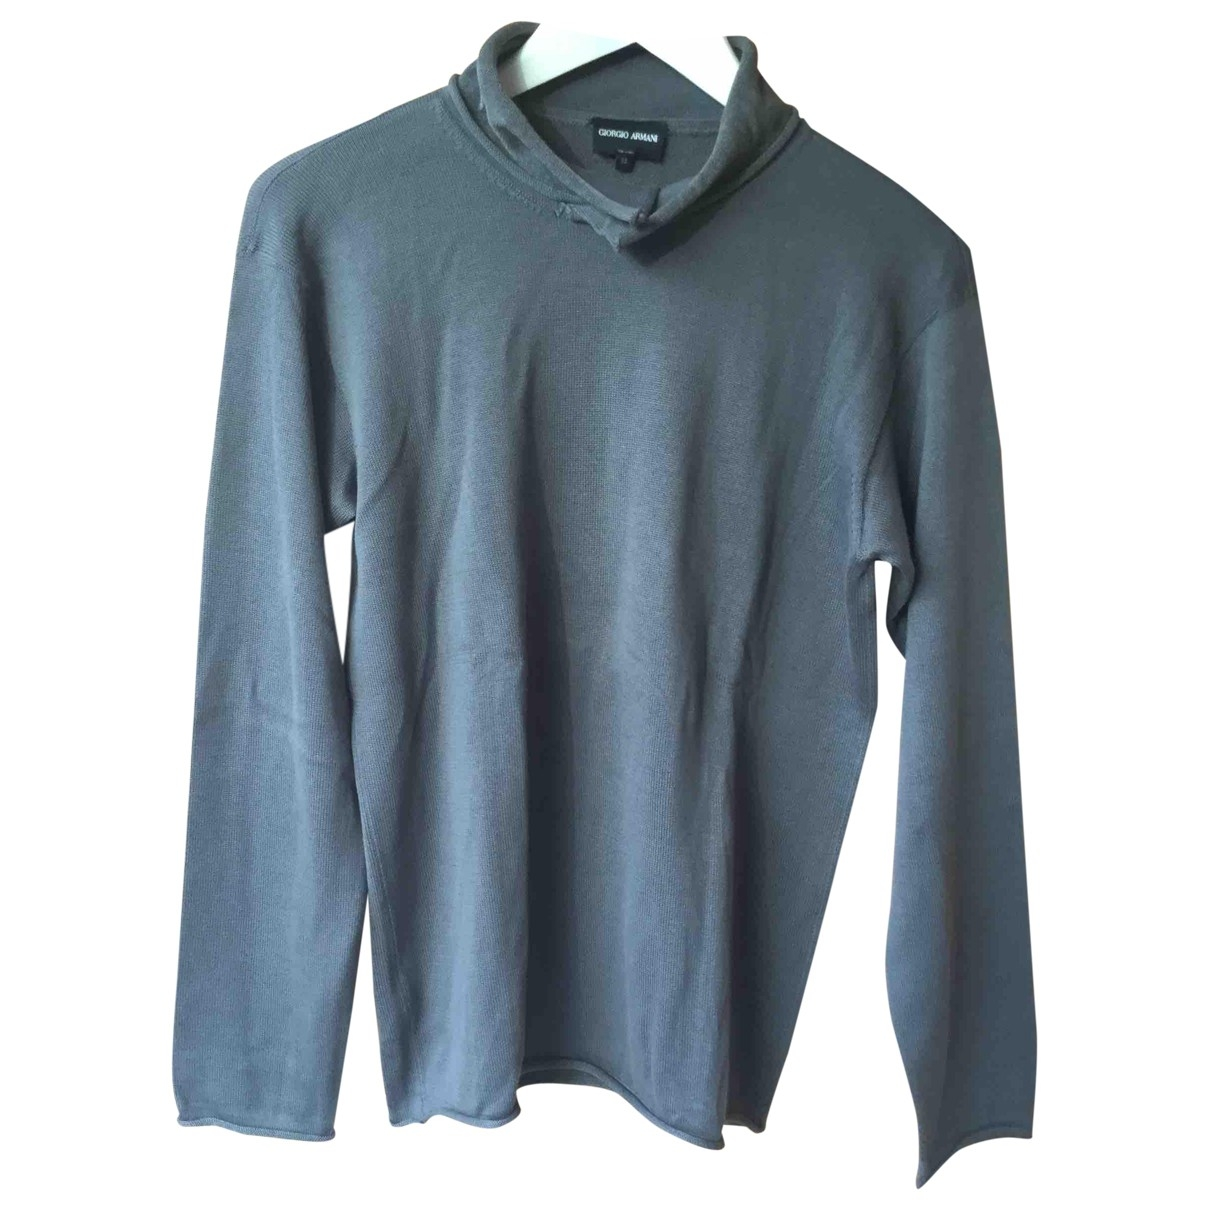 Giorgio Armani - Pull   pour femme en coton - gris